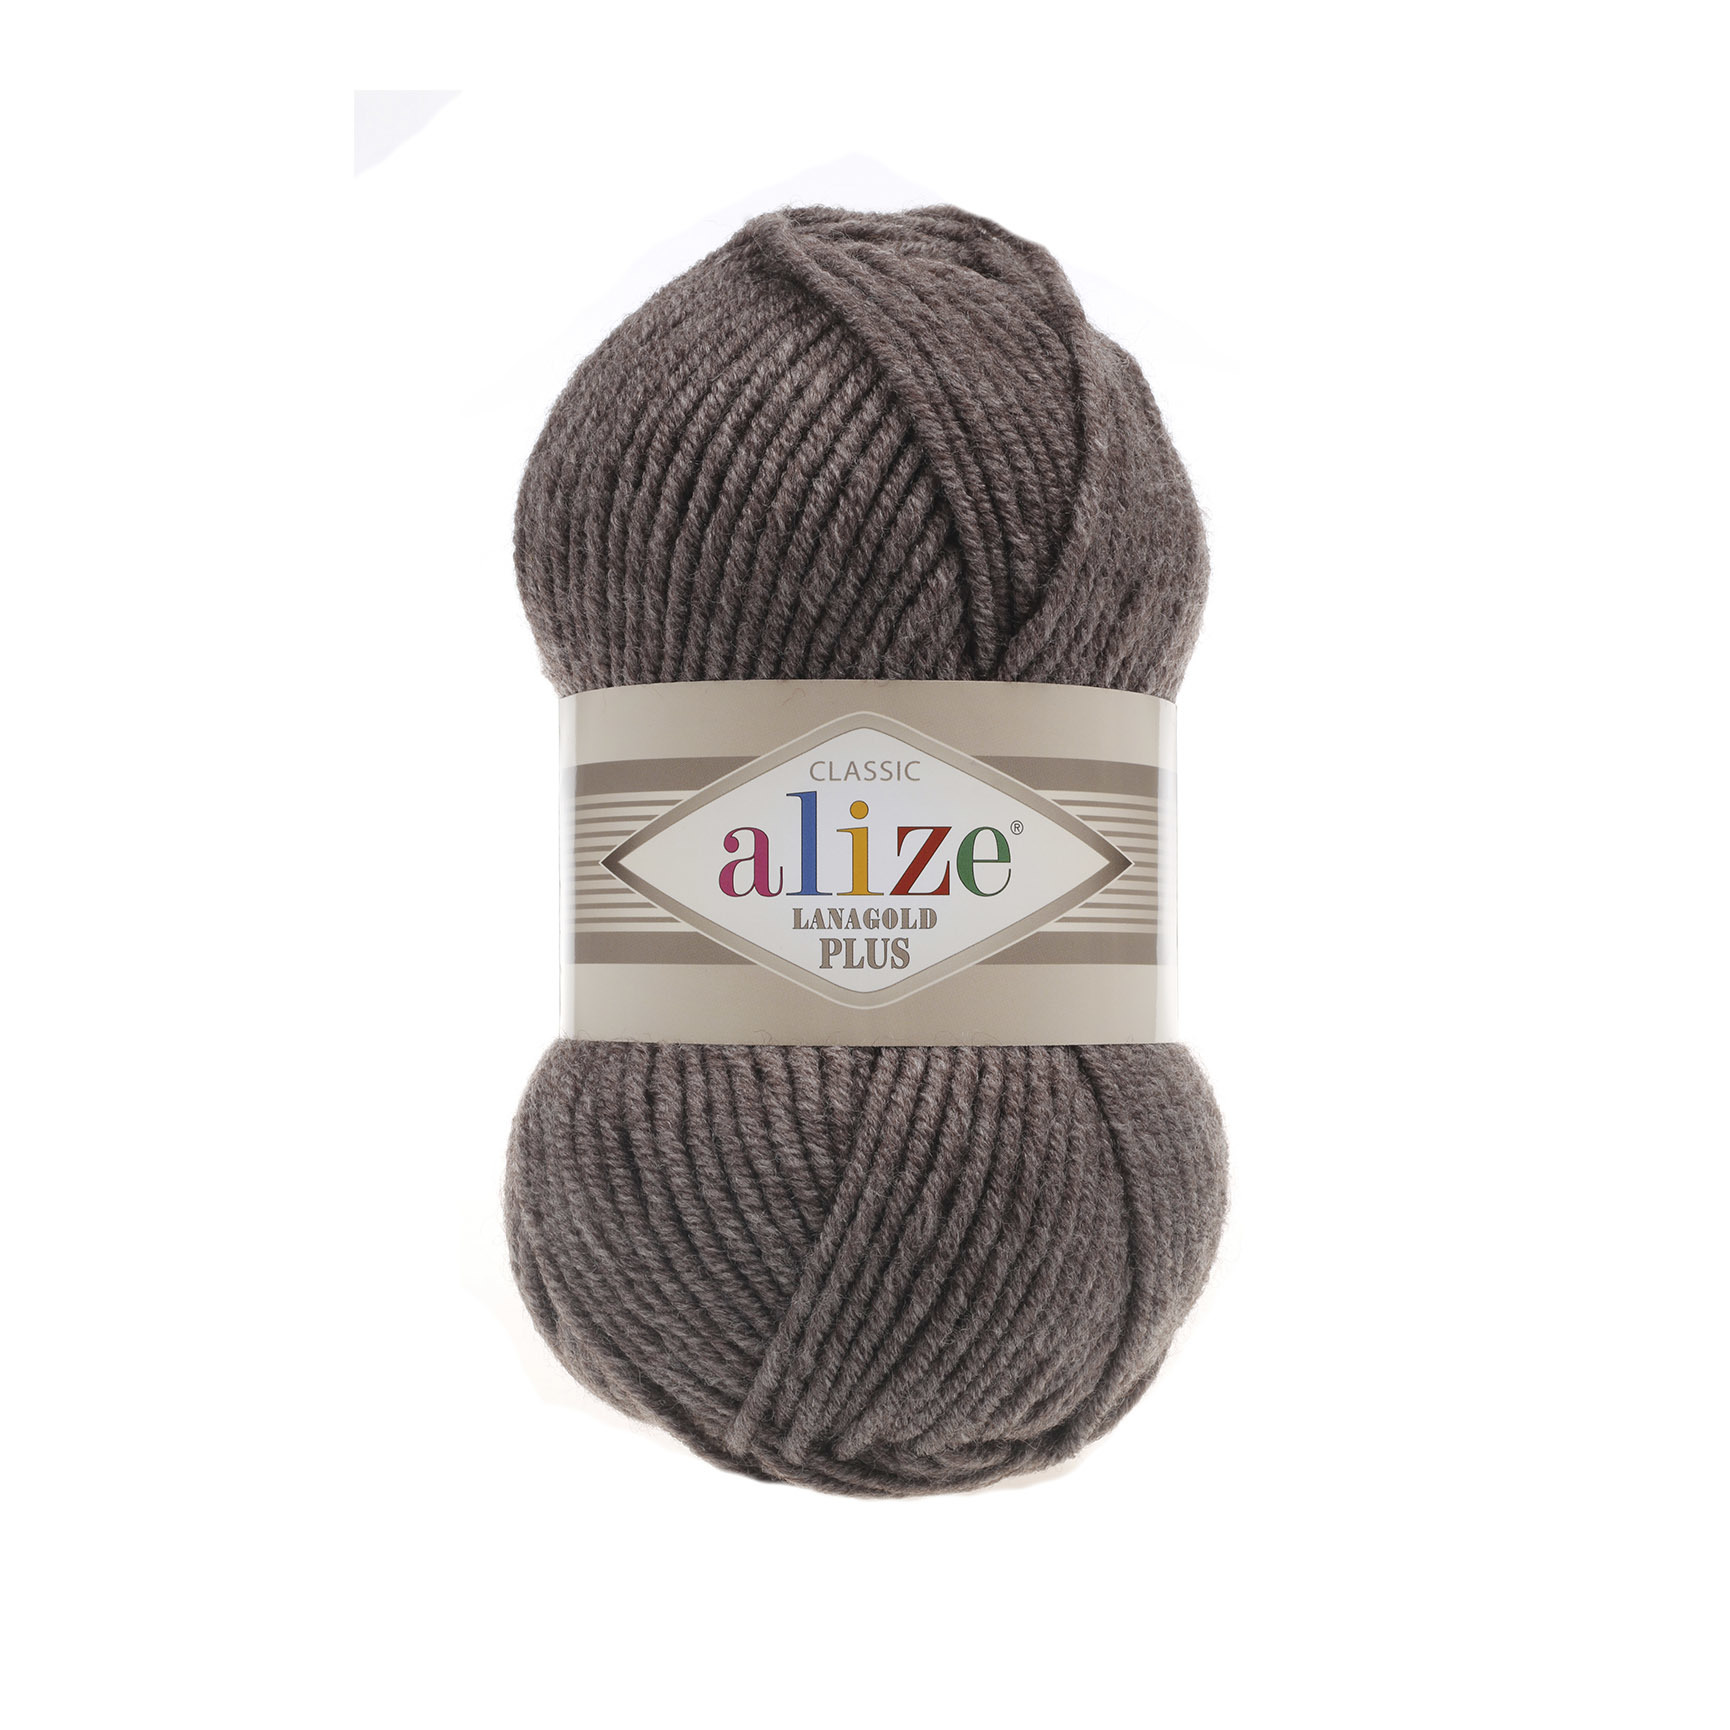 Пряжа Alize Lanagold Plus коричневый меланж 240